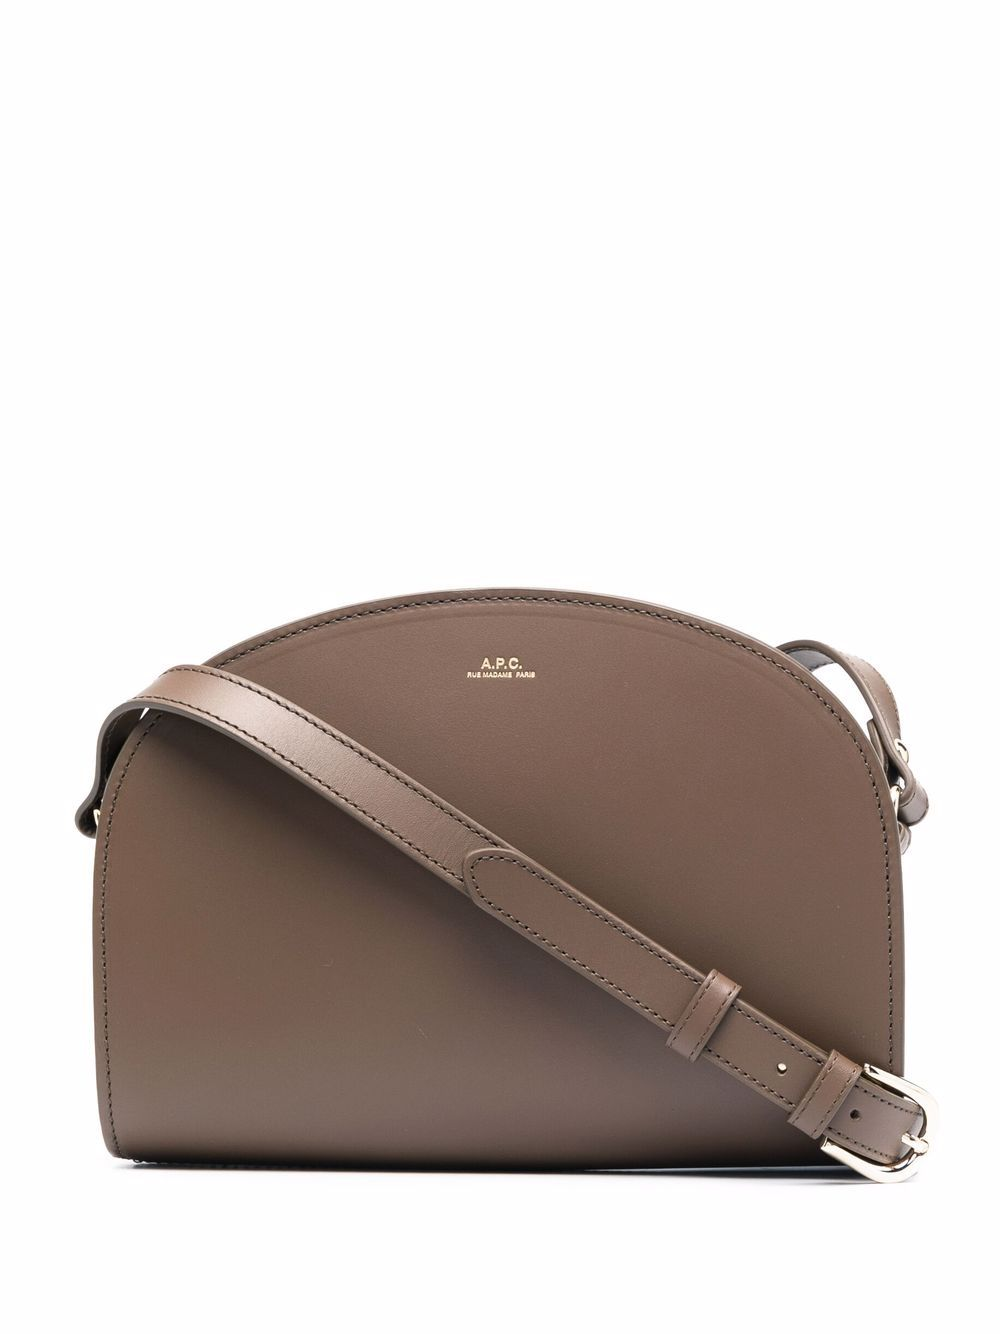 <p class='small-title'>A.P.C.</p>Demi Lune Cross Body Bag